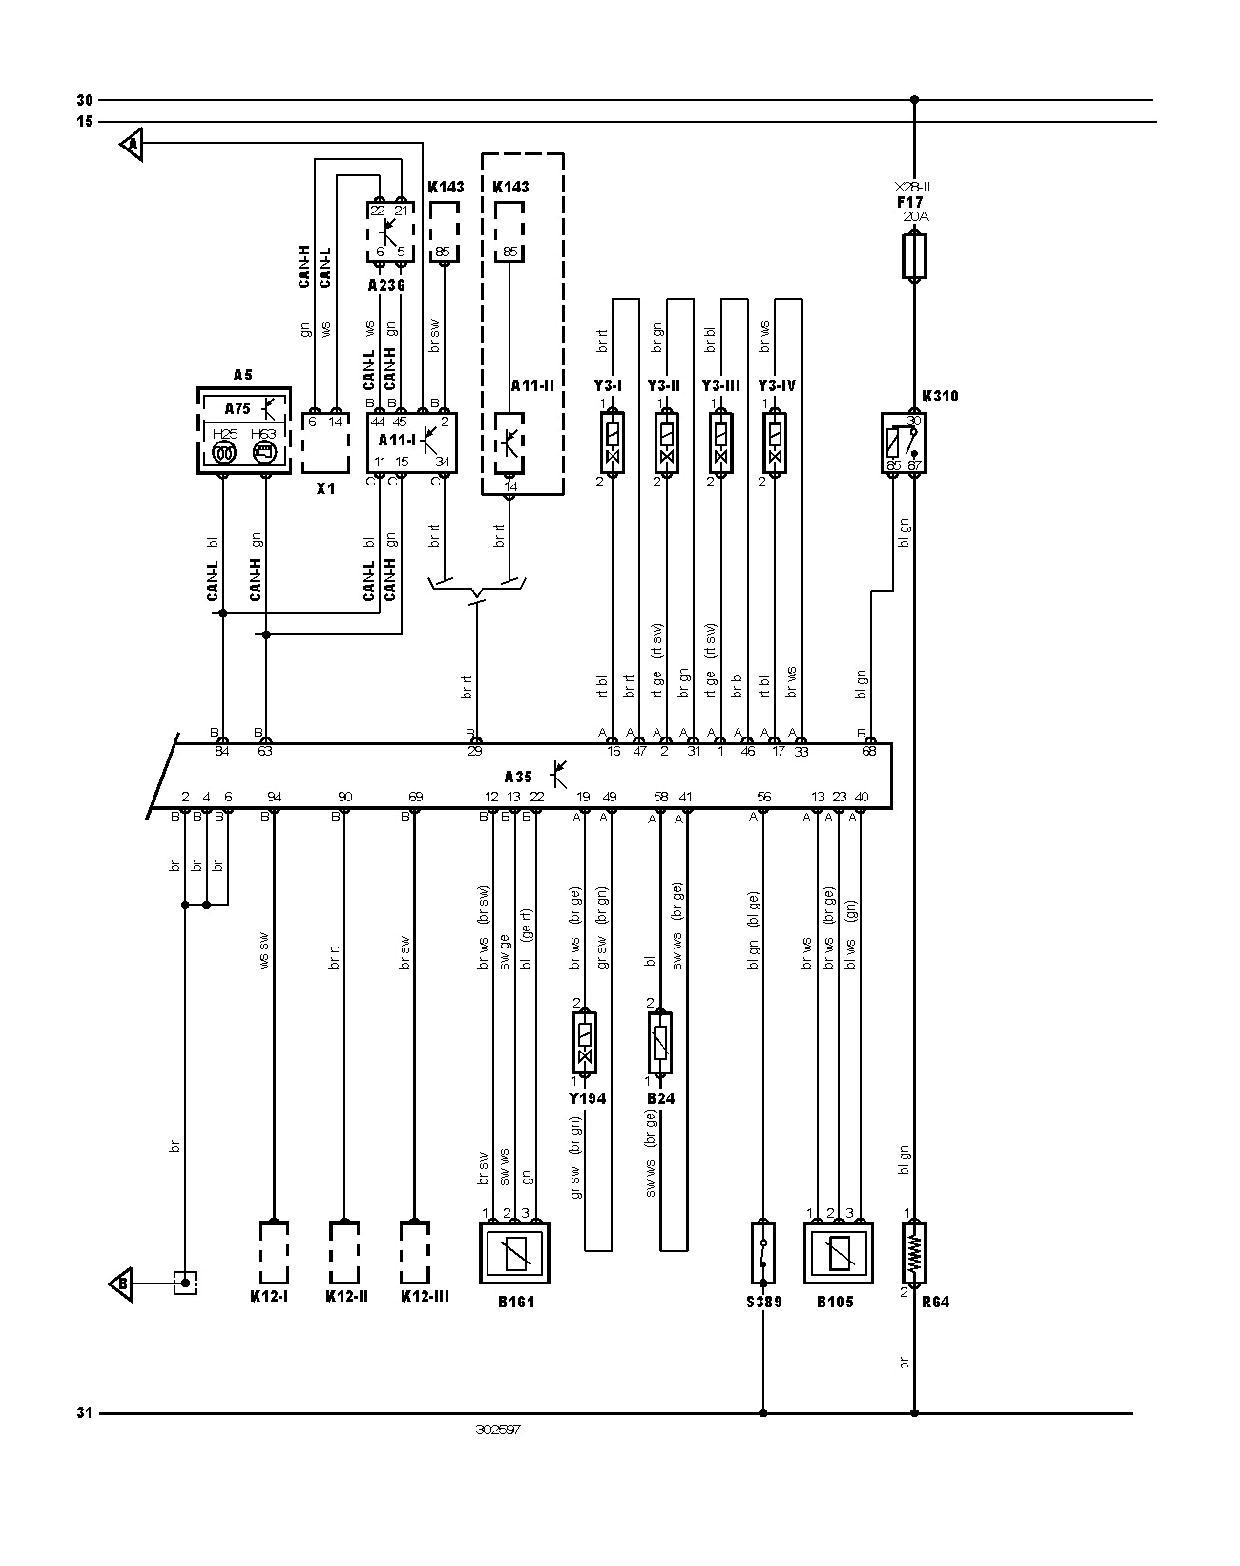 wiring diagram opel astra h cdti  opel  auto wiring diagram